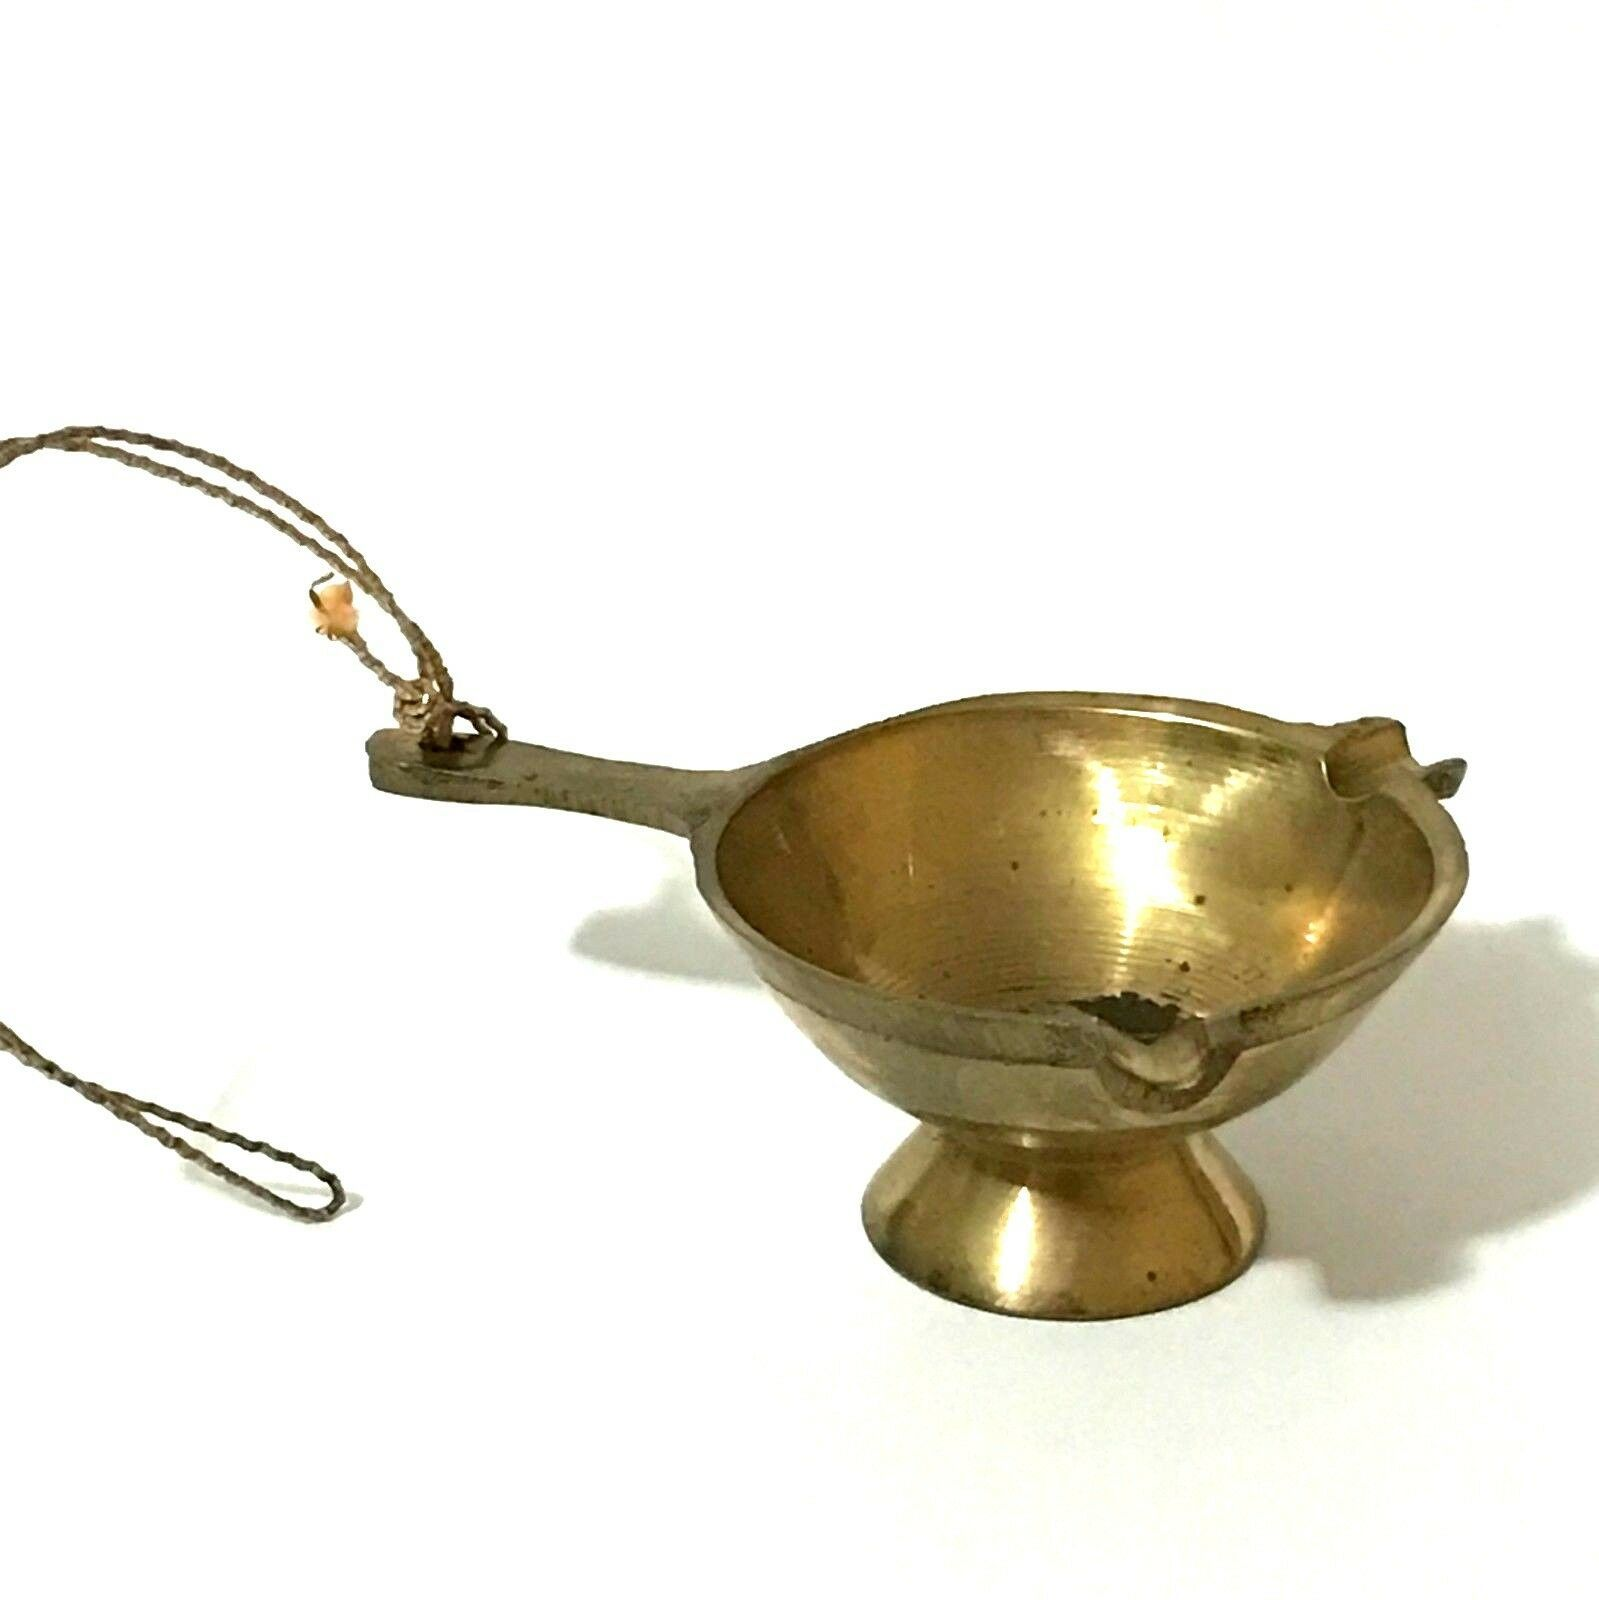 Vintage Miniature Brass Ornament Christmas Mini Ashtray With Handle Gold Patina image 10